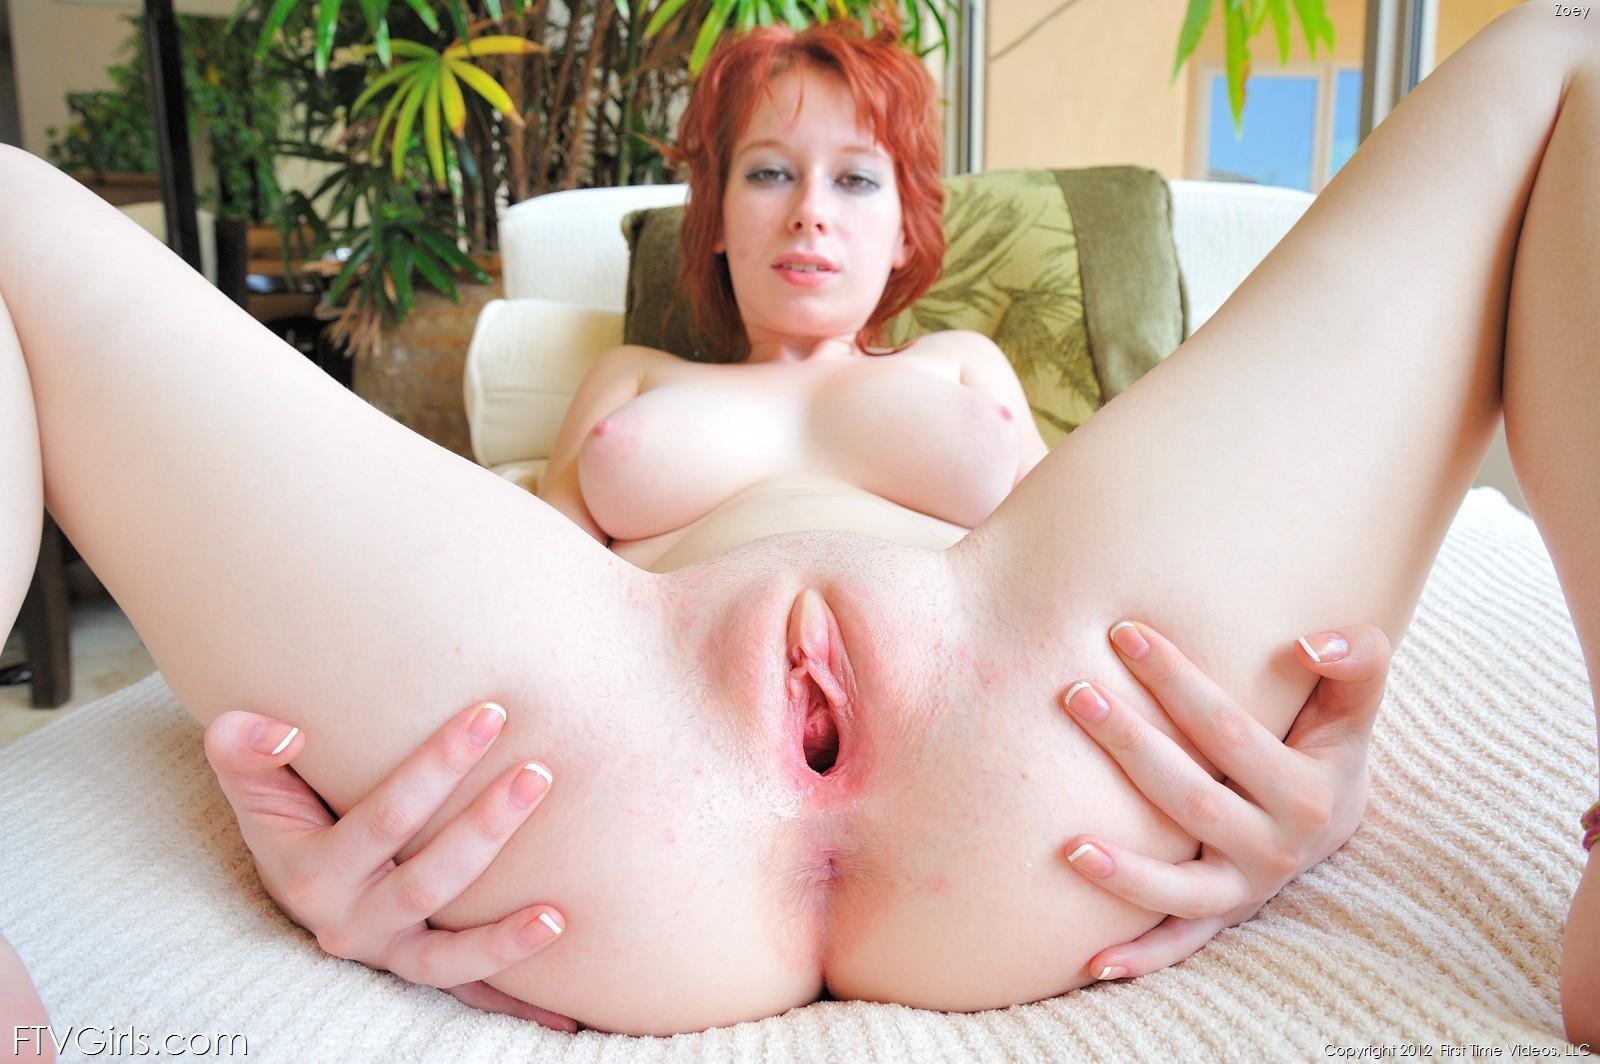 4Shared Porn pretty first time redhead girl fucks dildo - pichunter